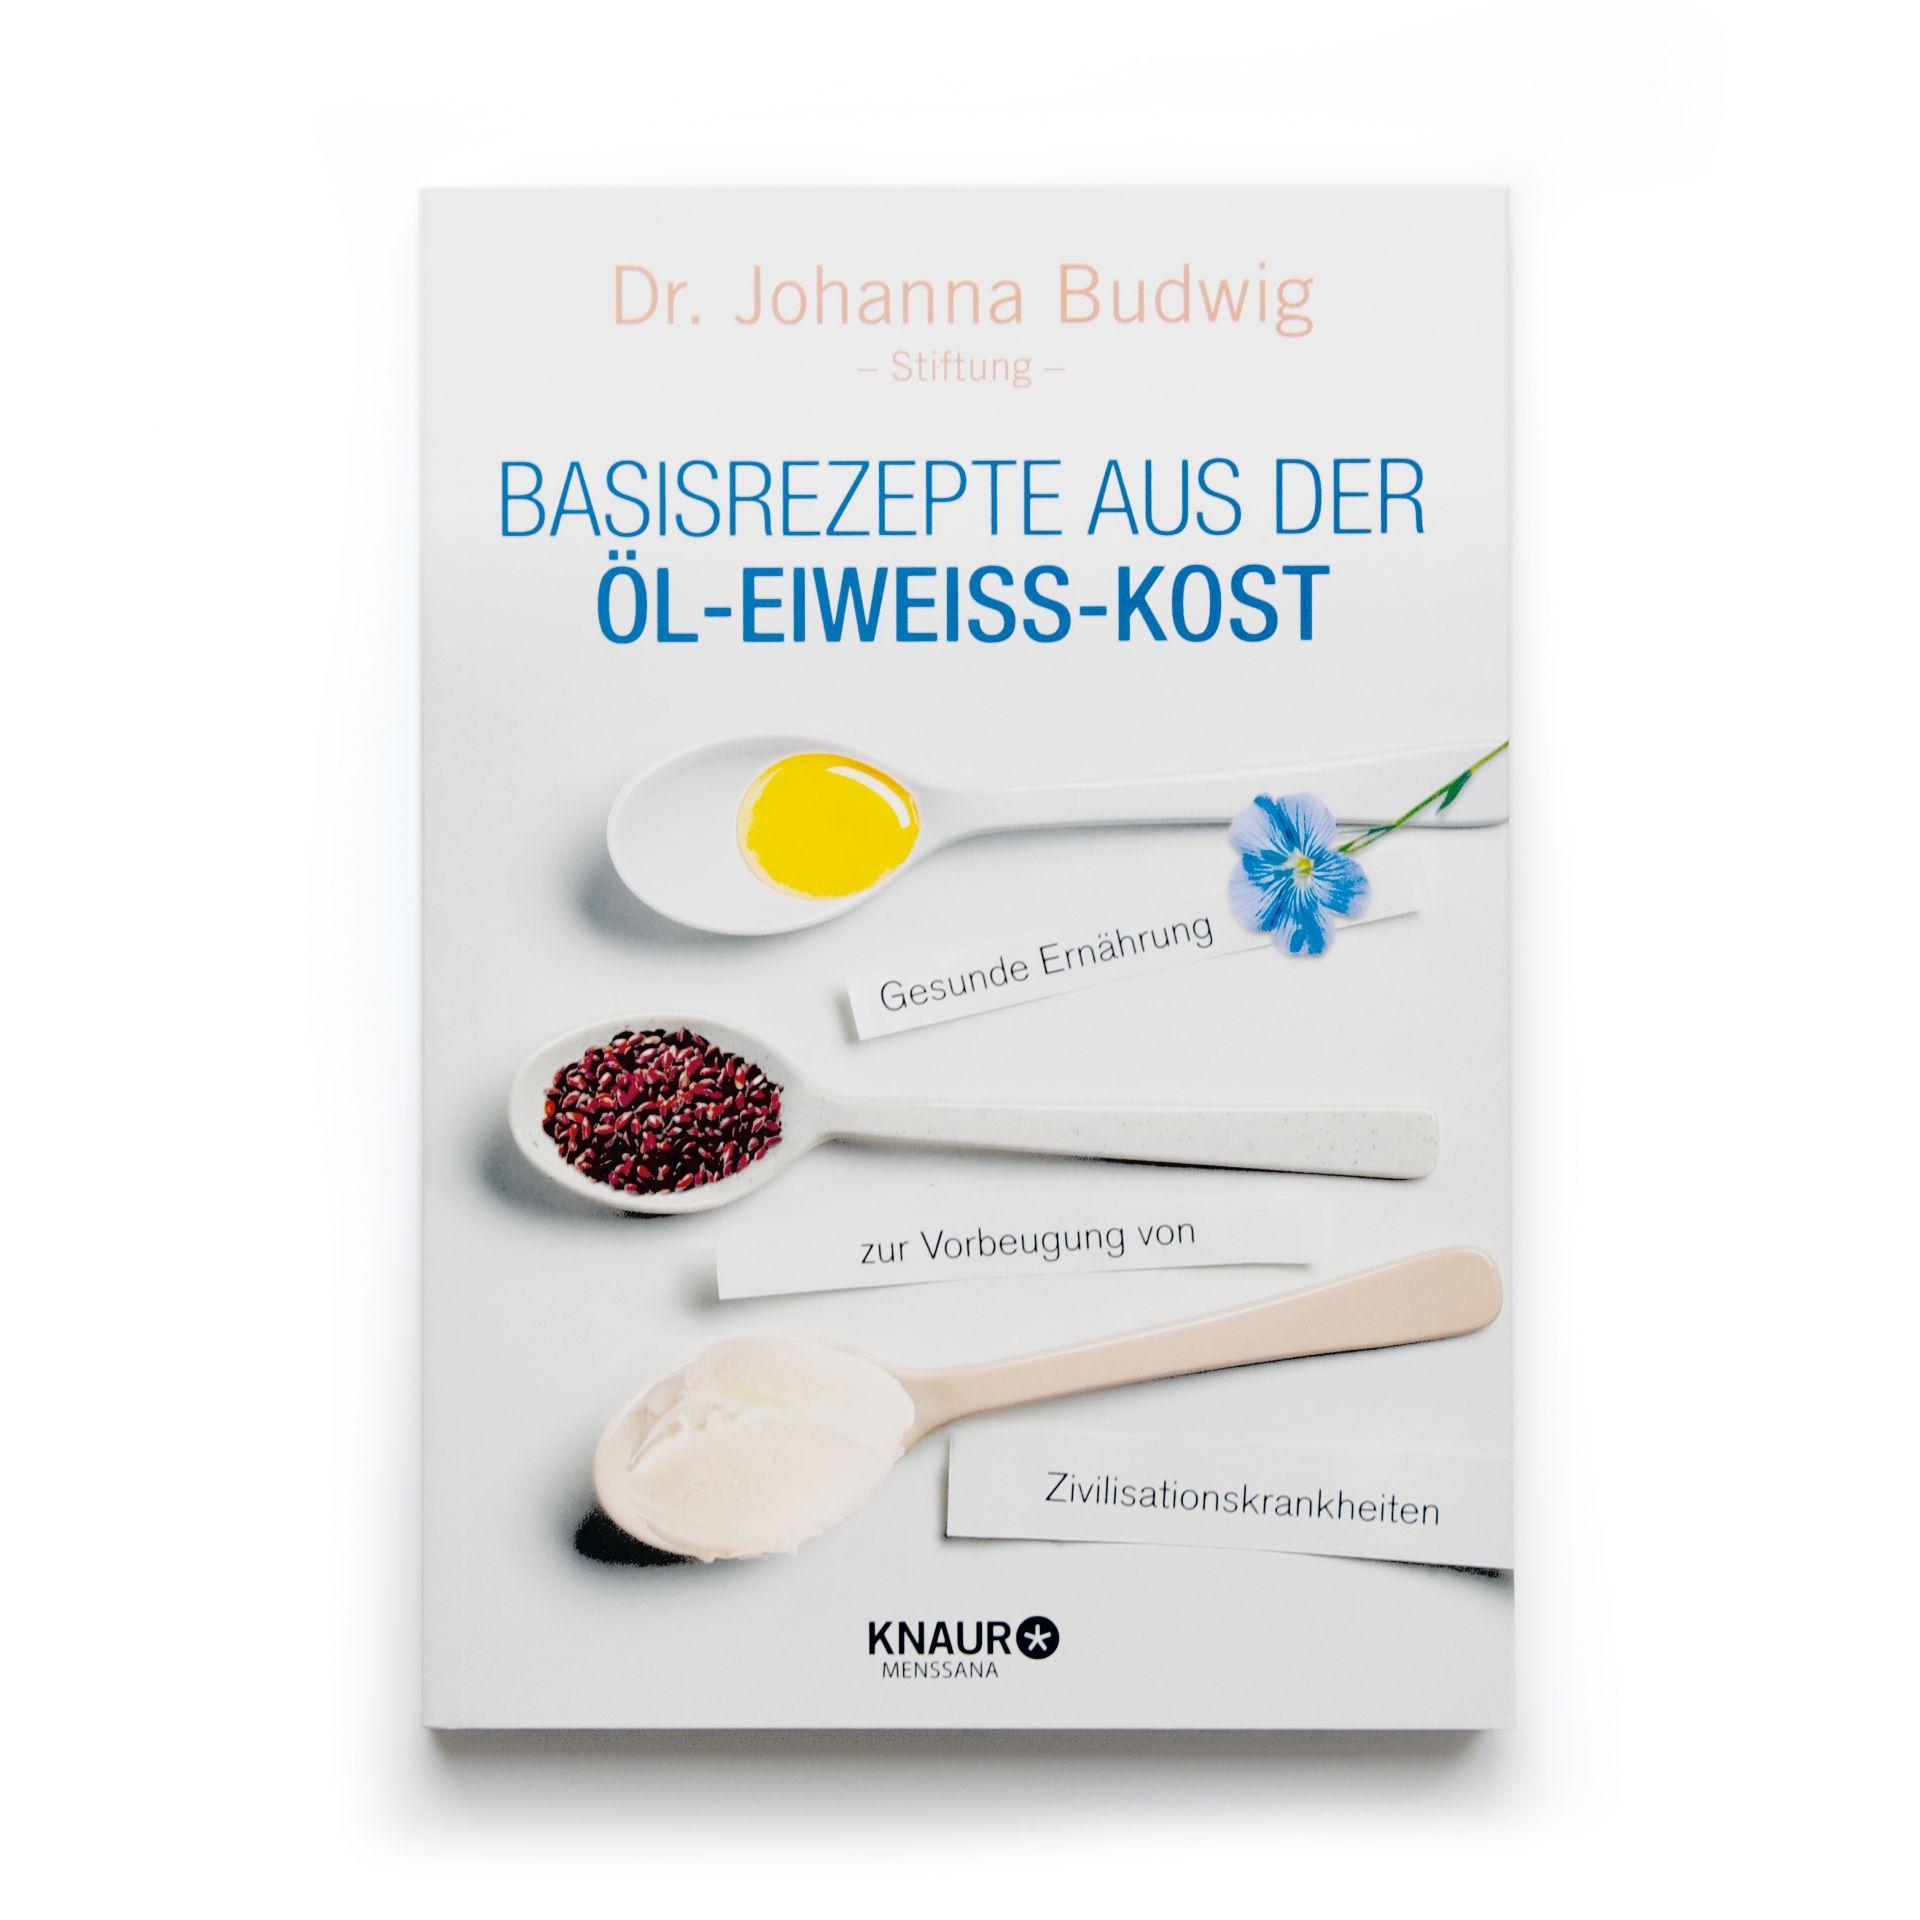 Dr. Budwig Basisrezepte Öl-Eiweiß-Kost